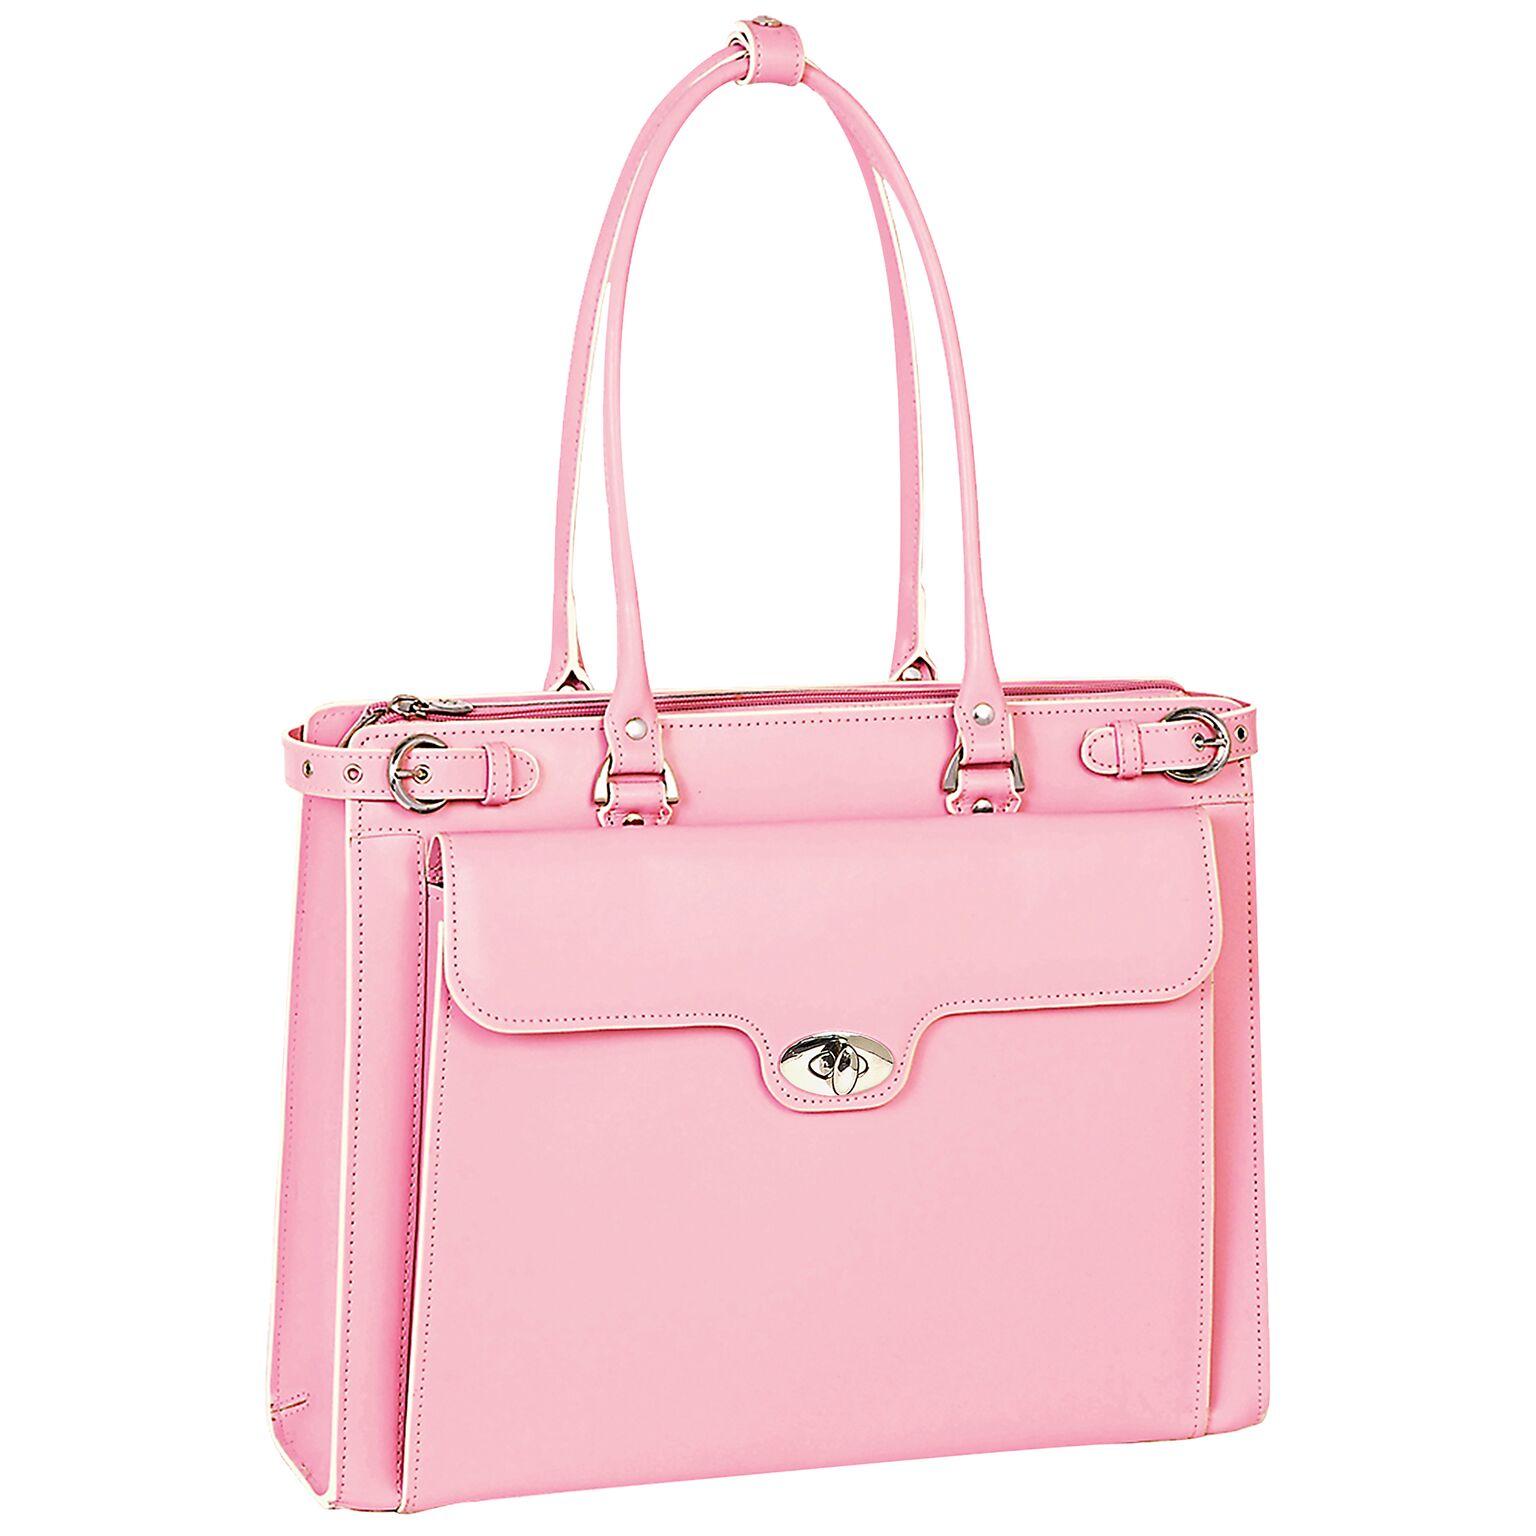 McKlein 94839 MCKLEIN WINNETKA 94839 (Pink) Leather Ladies' Briefcase w/ Removable Sleeve - W Series - Italian Leather